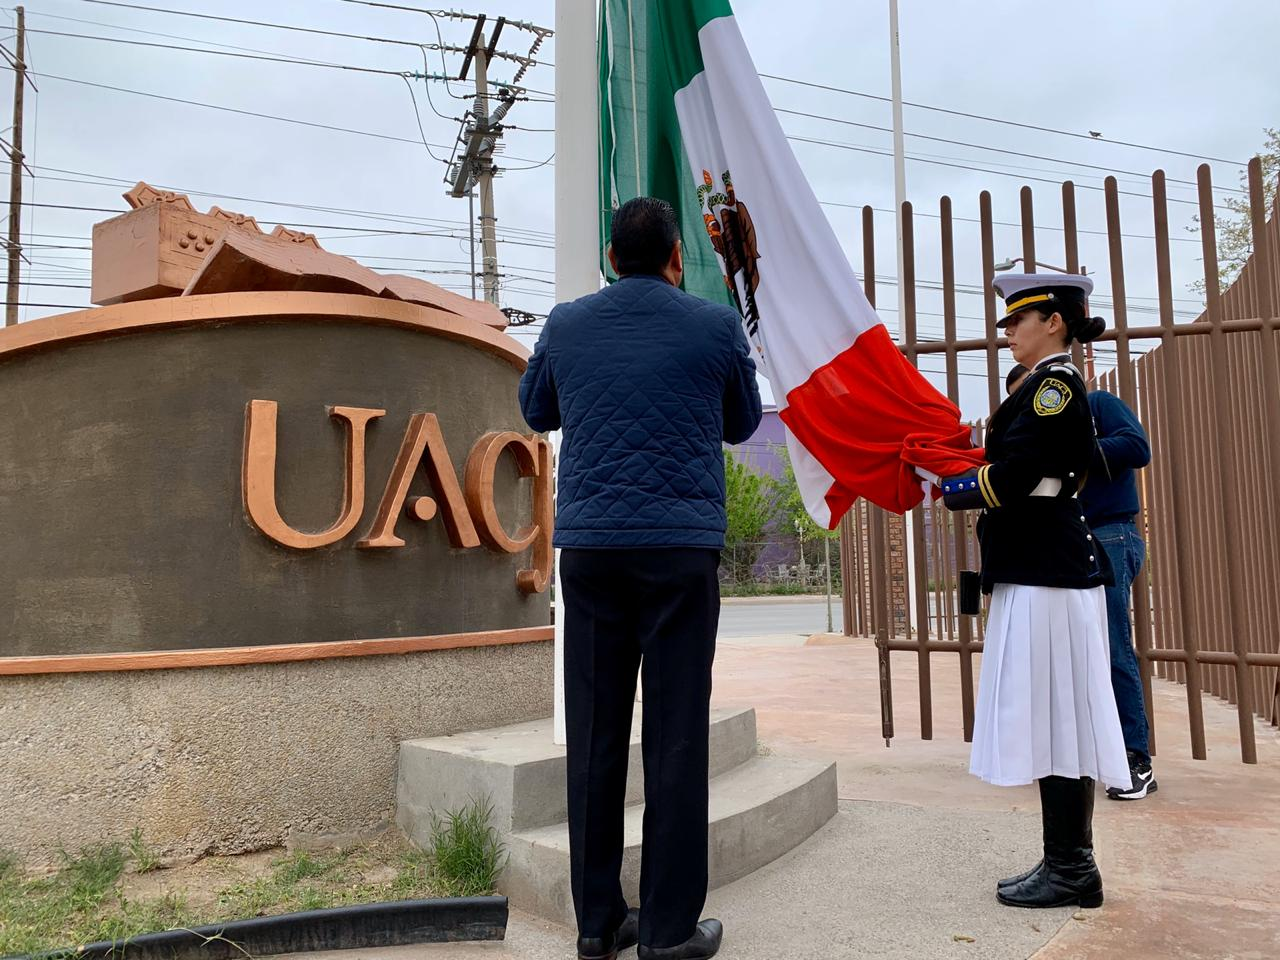 Izan bandera en la UACJ